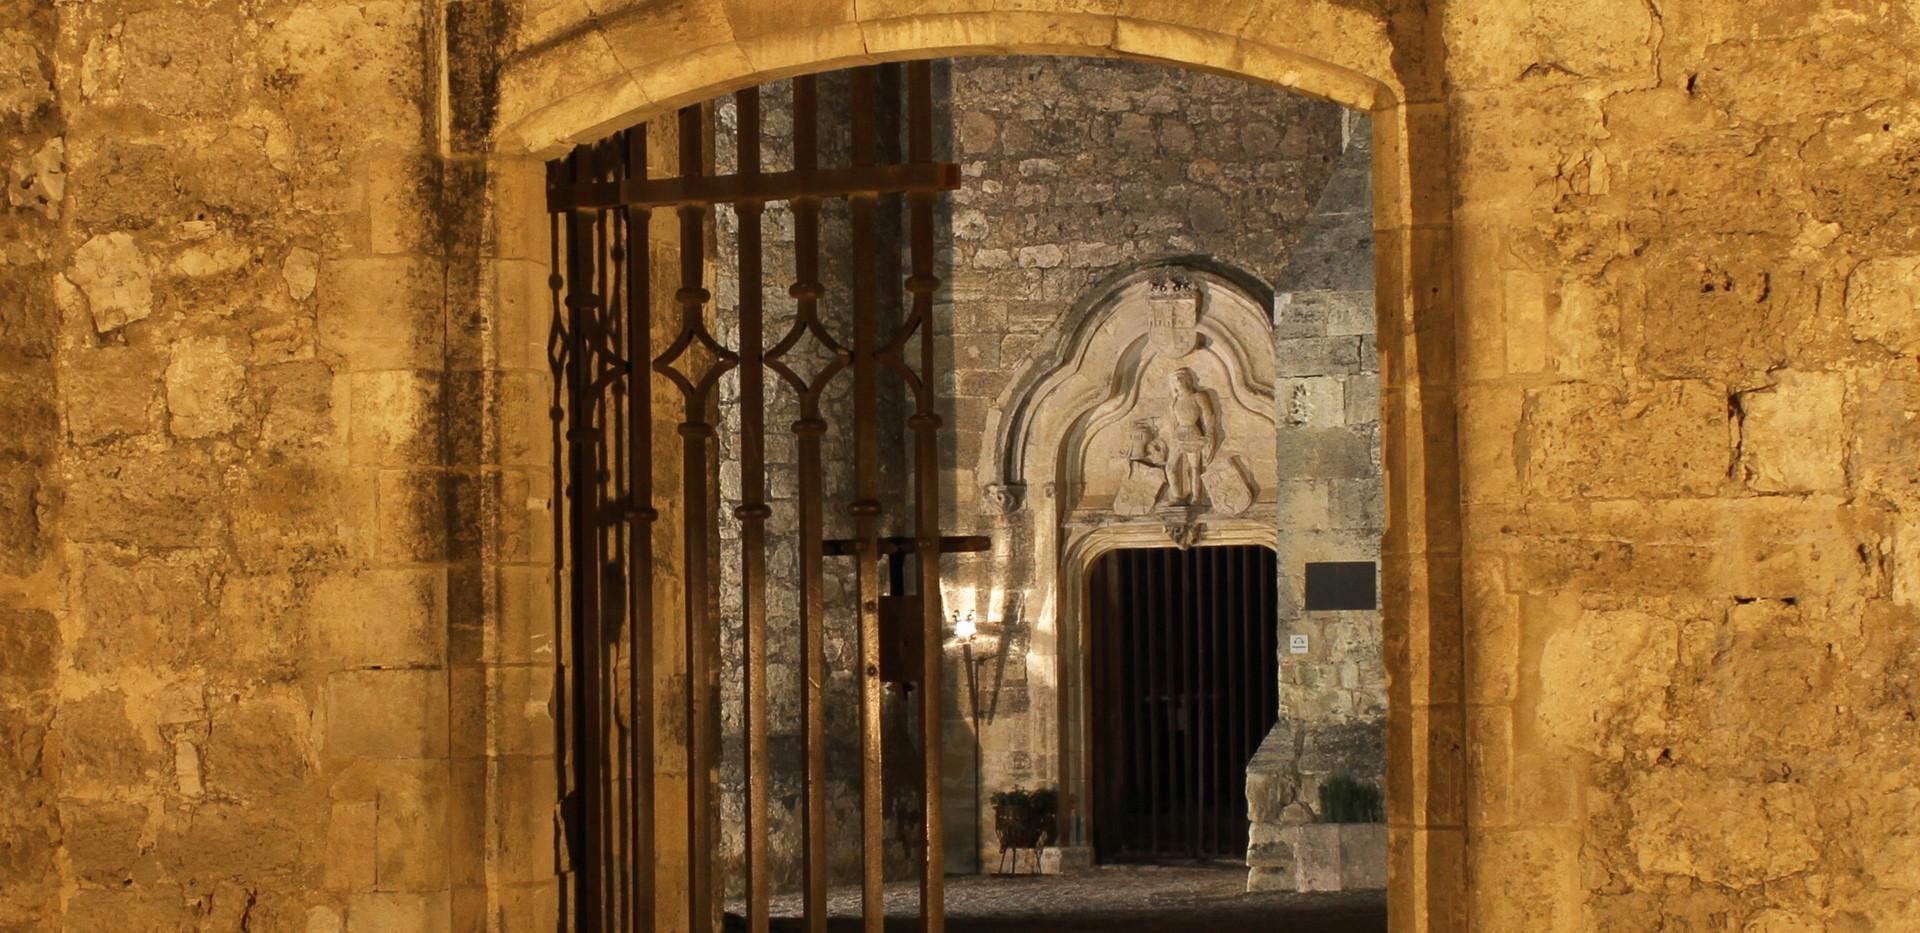 Castillo de Belmonte Portada